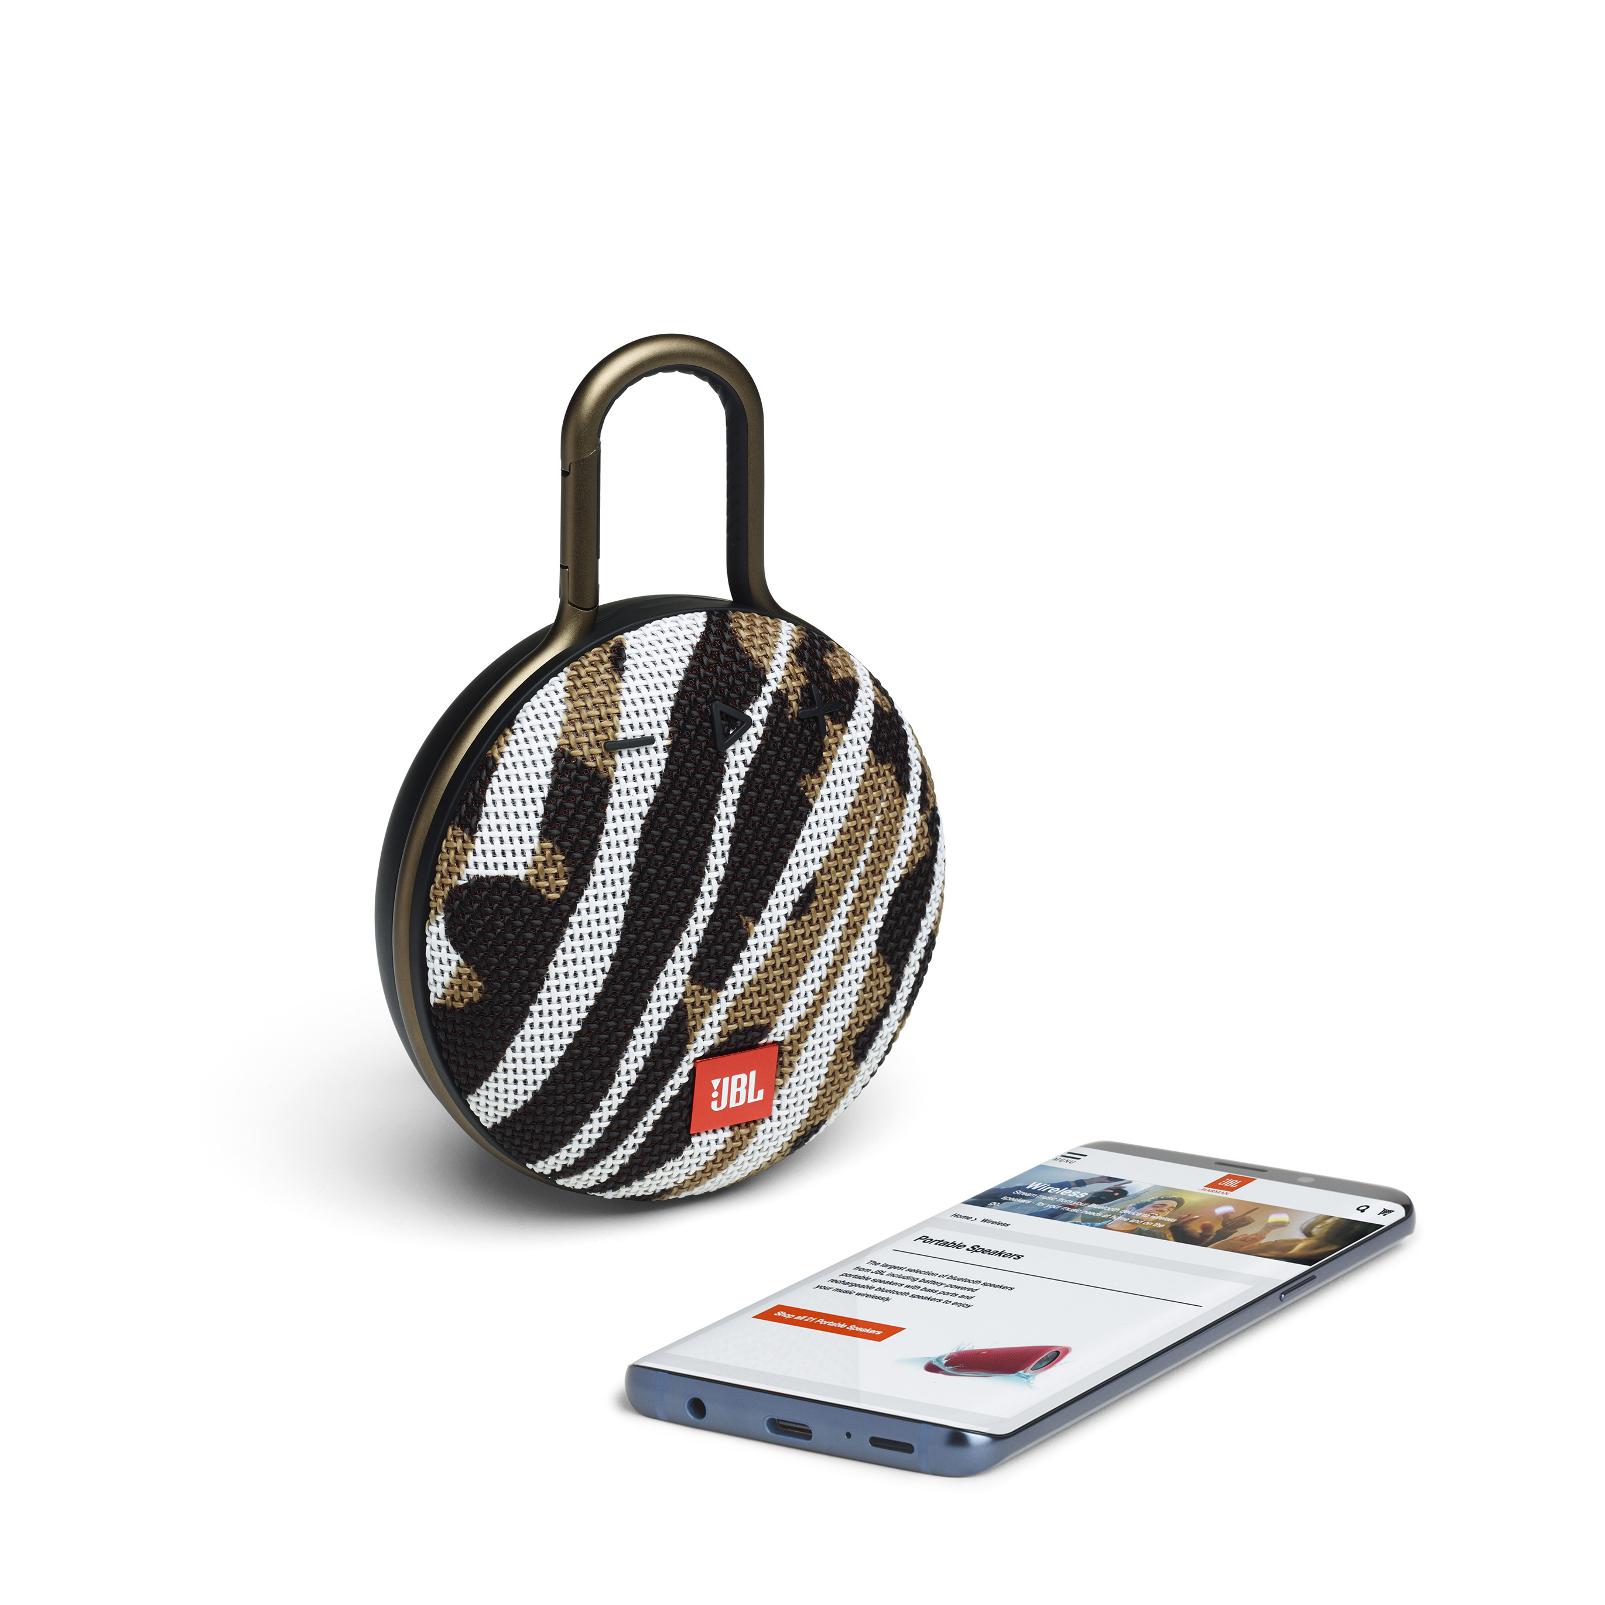 JBL CLIP 3 - BlackWhite/Brown Camo - Portable Bluetooth® speaker - Detailshot 1